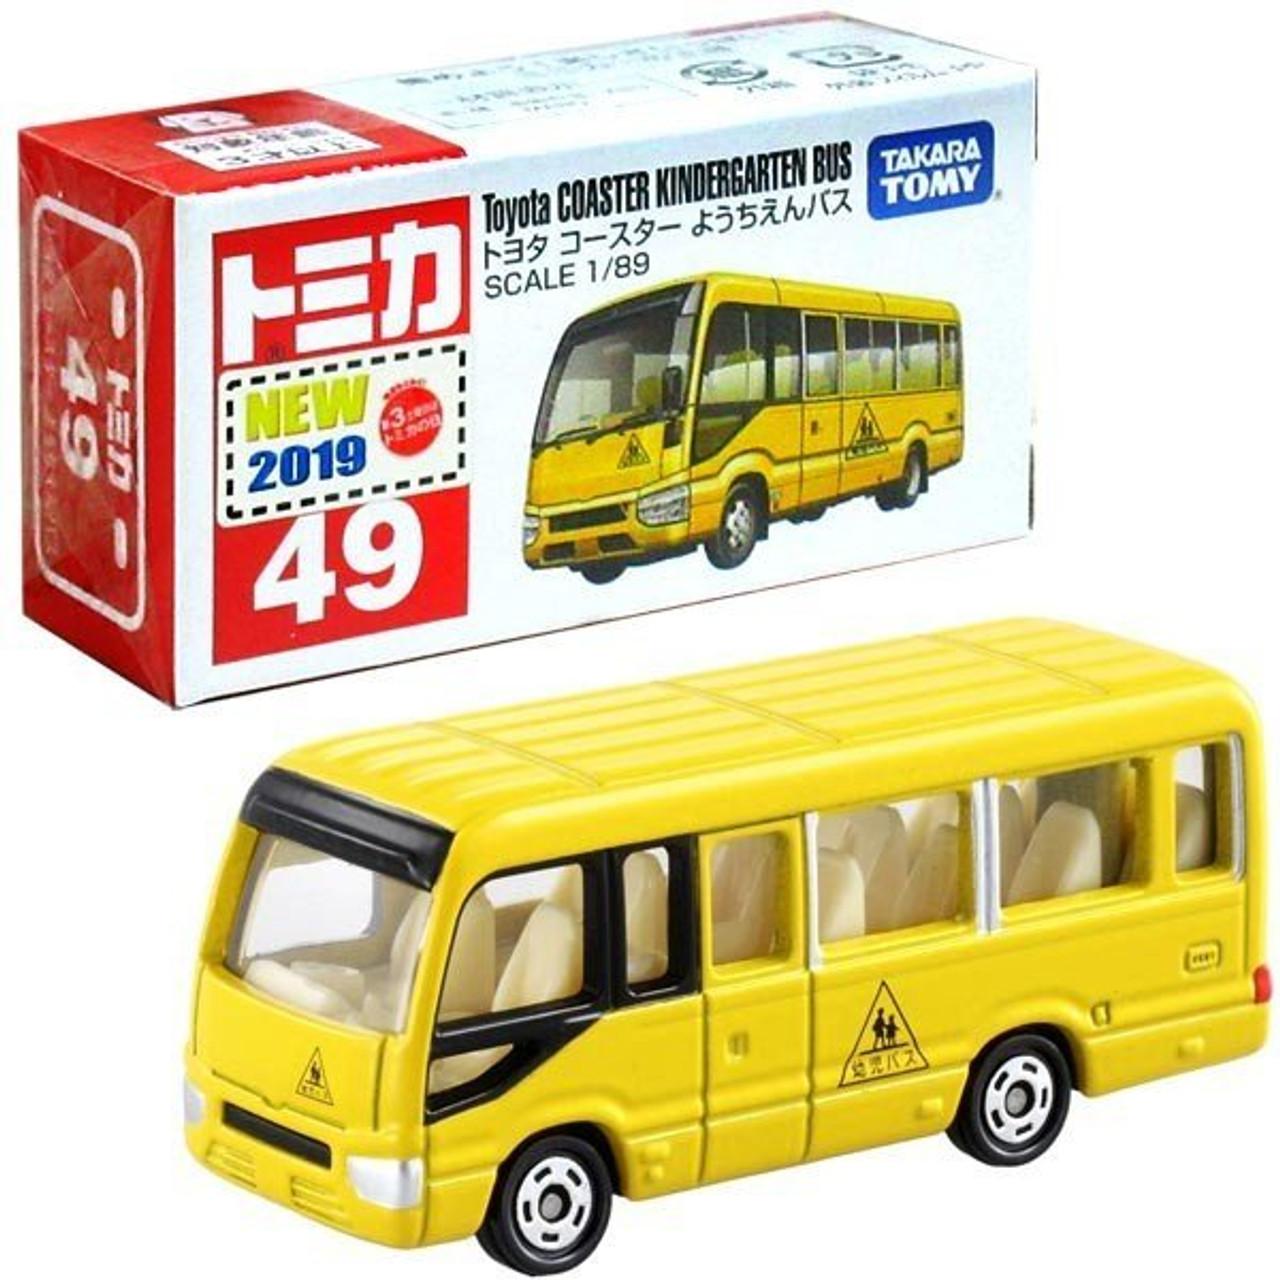 FS box Japan Takara Tomy Tomica 49 Toyota Coaster kindergarten bus